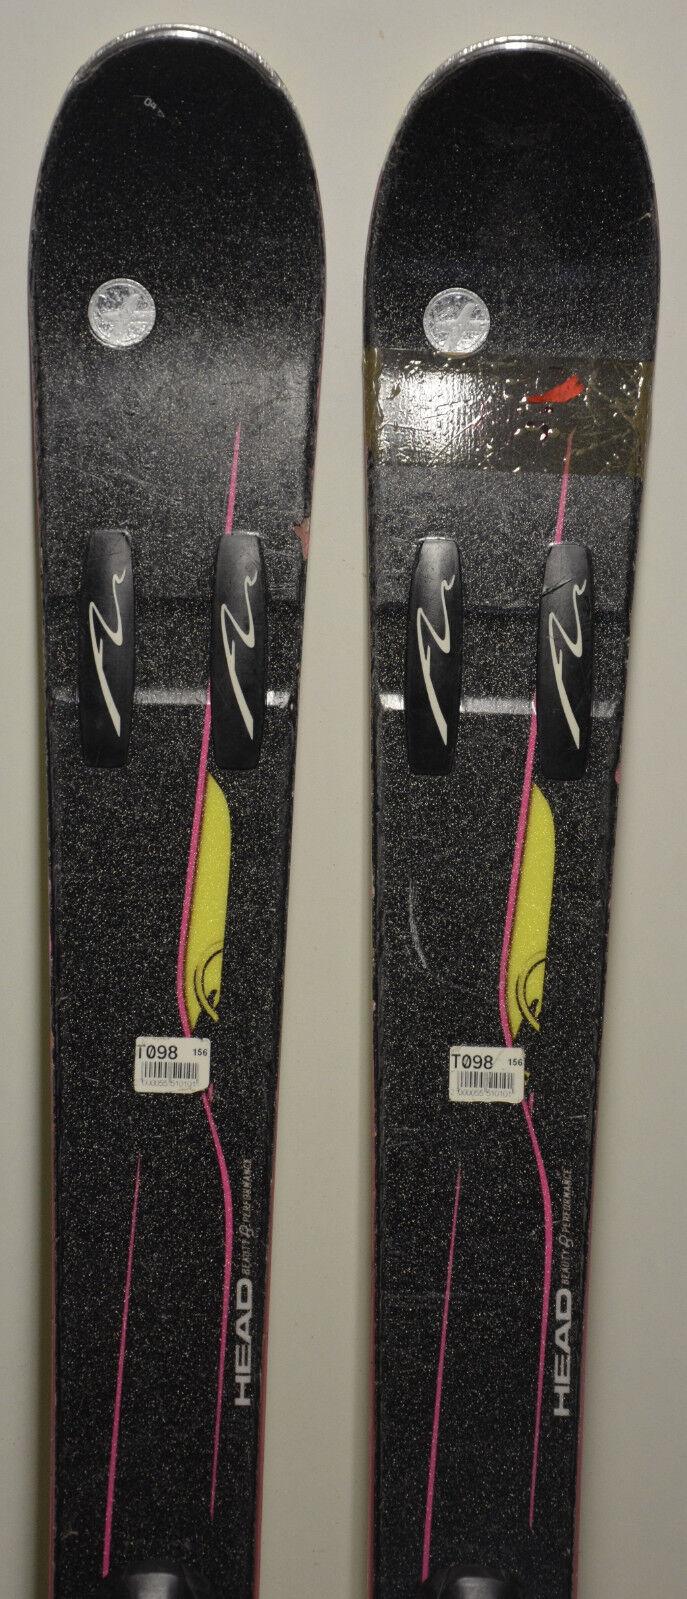 Ski parabolisch gebraucht Frau HEAD Mya Mya Mya   8 - 156cm & 163cm 7cbdab